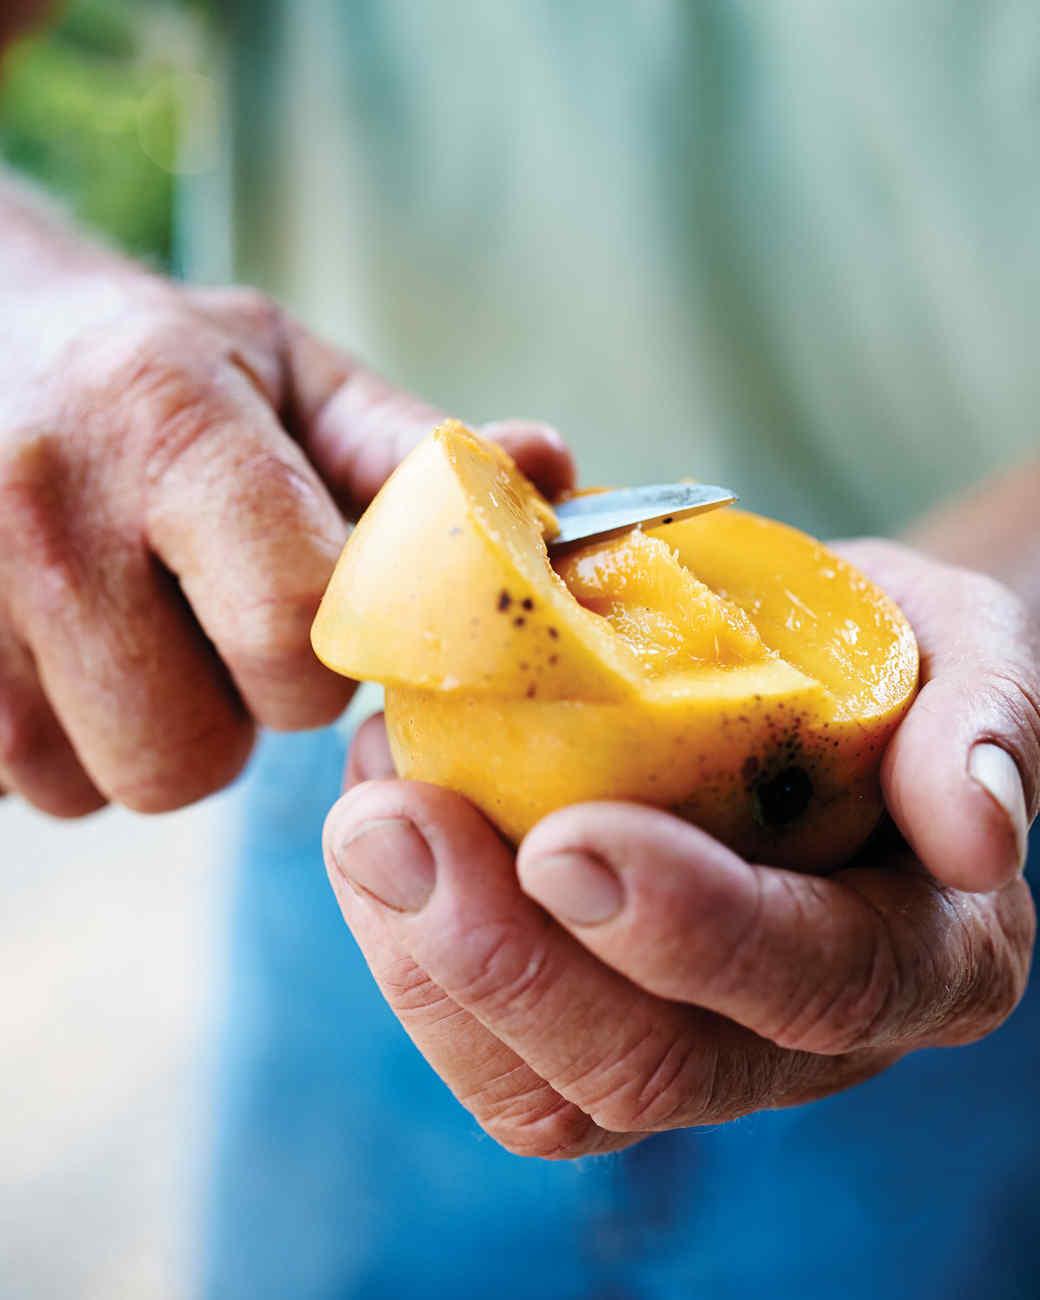 mango-fruit-001-d112247.jpg